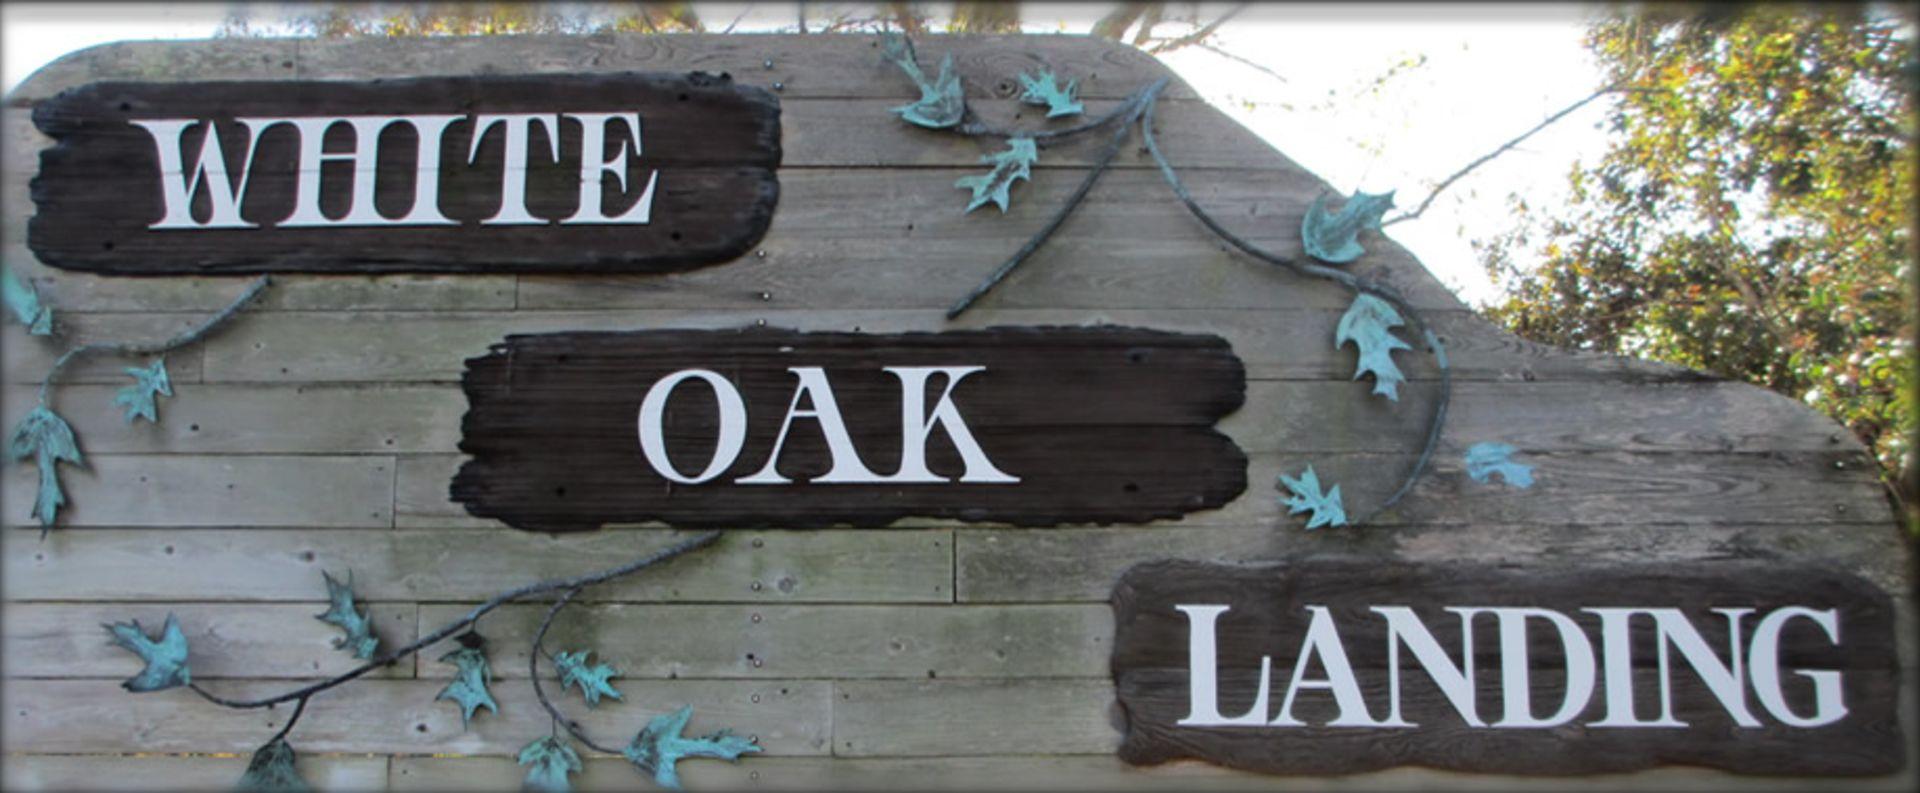 White Oak Landing